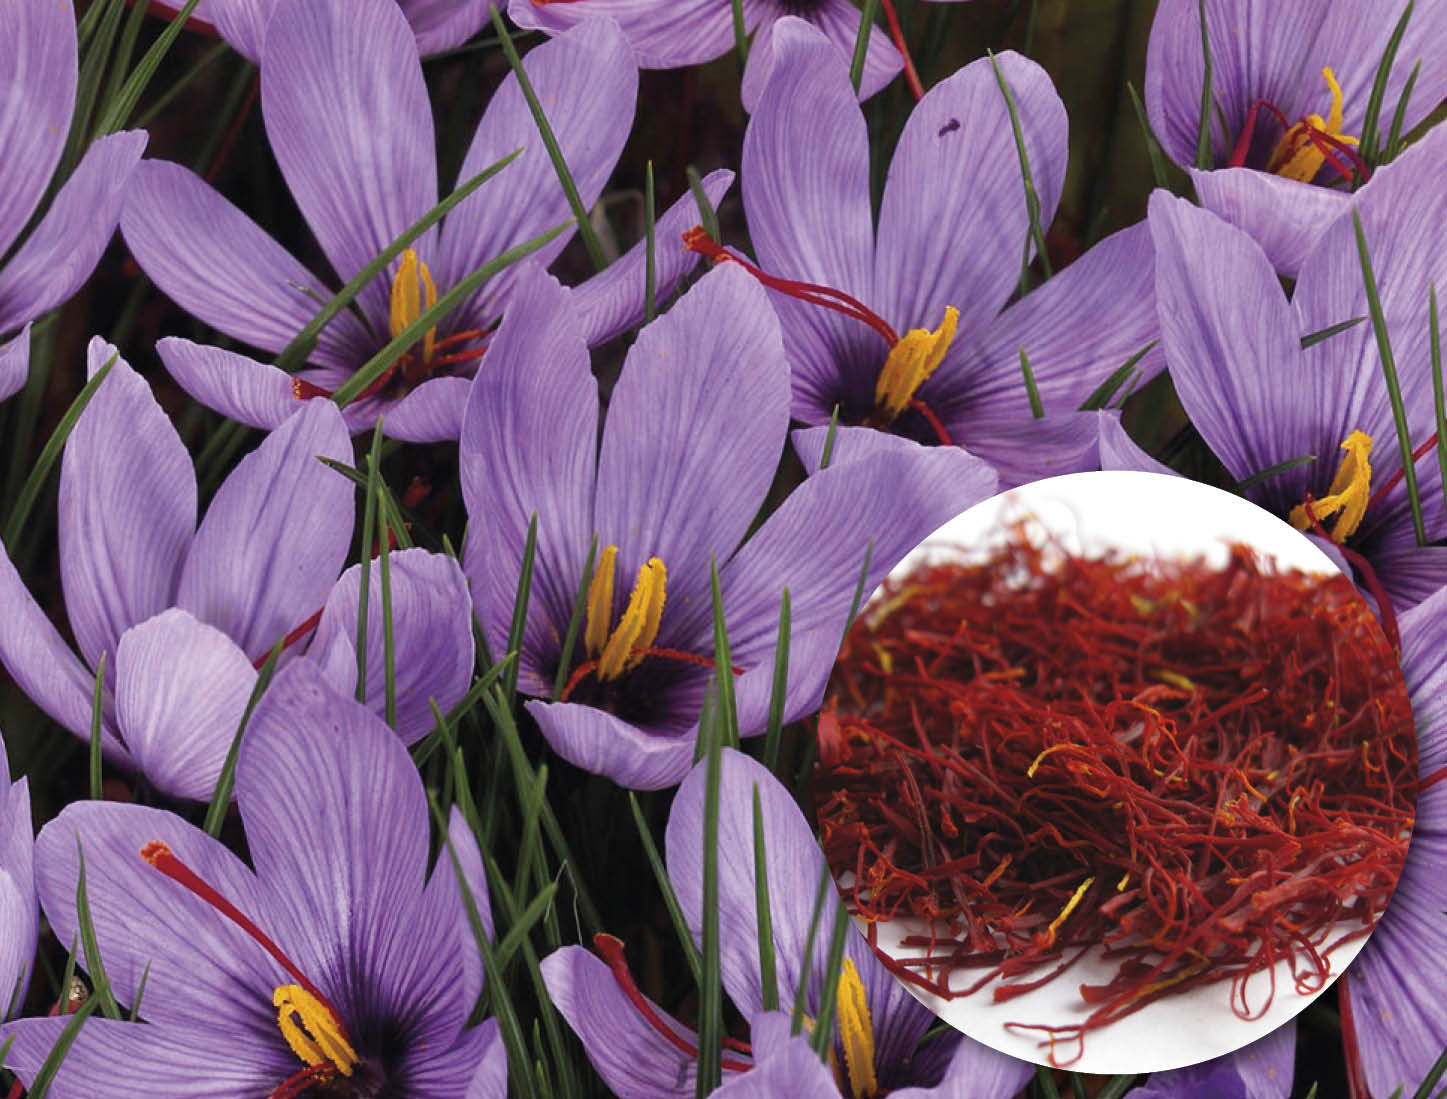 Crocus saffron